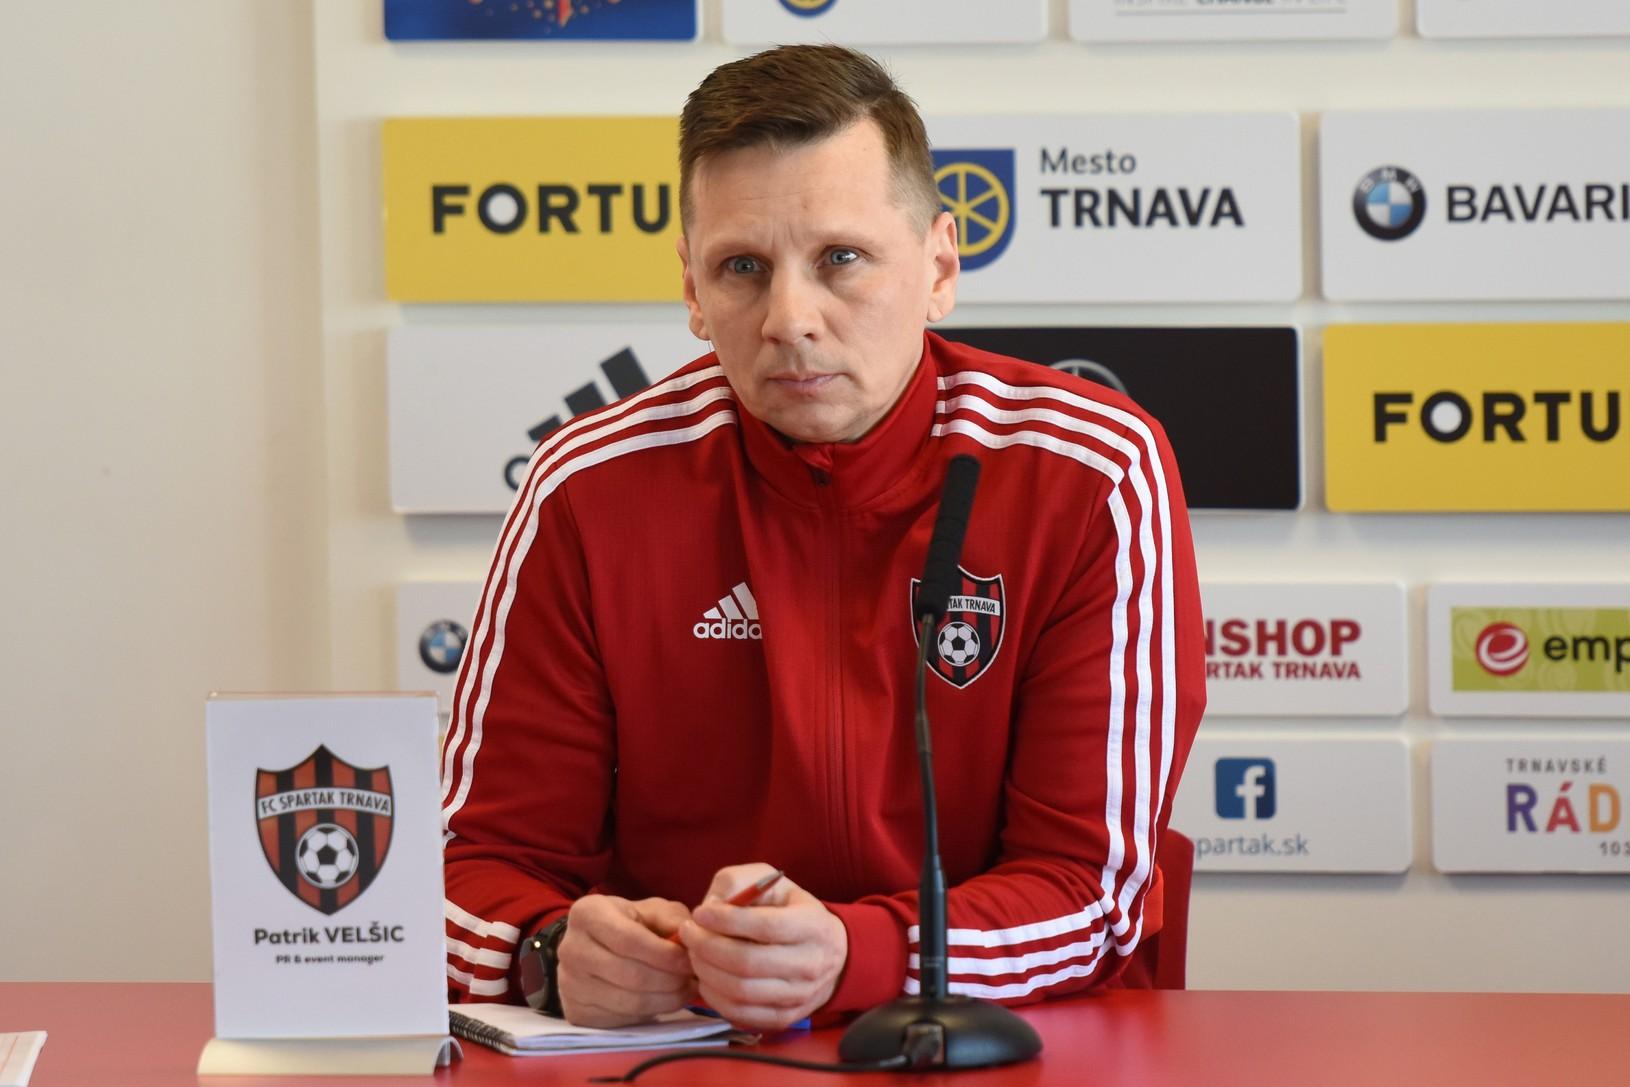 PR manažér Spartaka Patrik